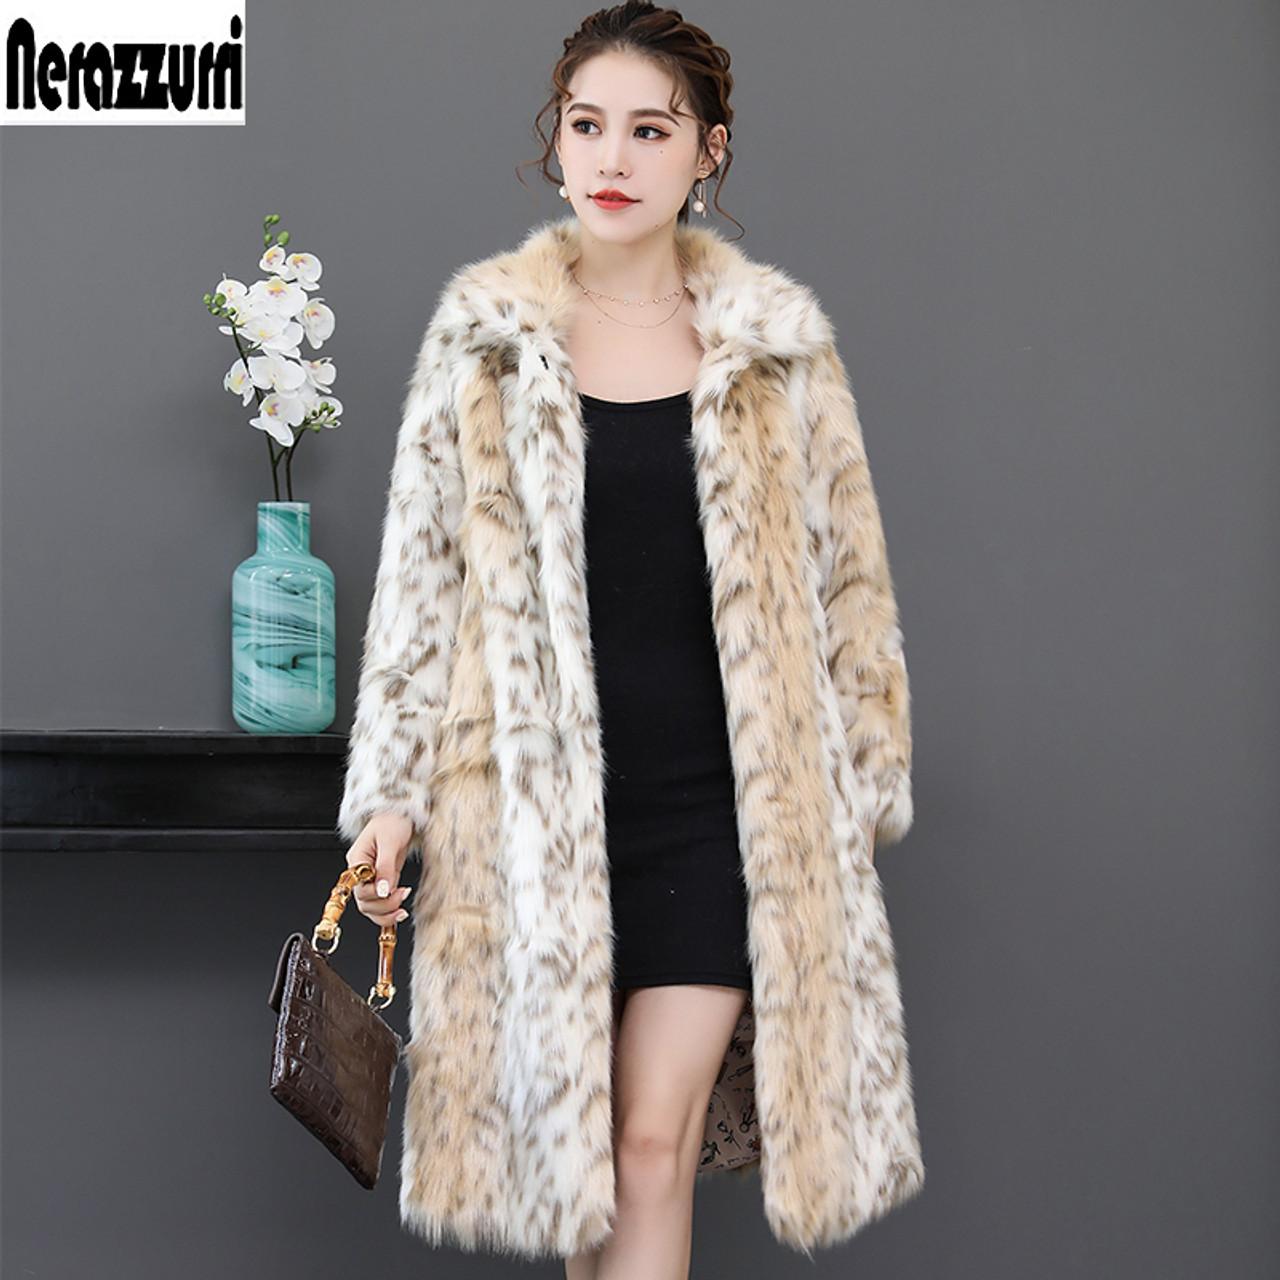 00f64b65401 Nerazzurri Long leopard faux fur coat for woman raglan sleeve winter fake  fur coat fluffy leopard ...